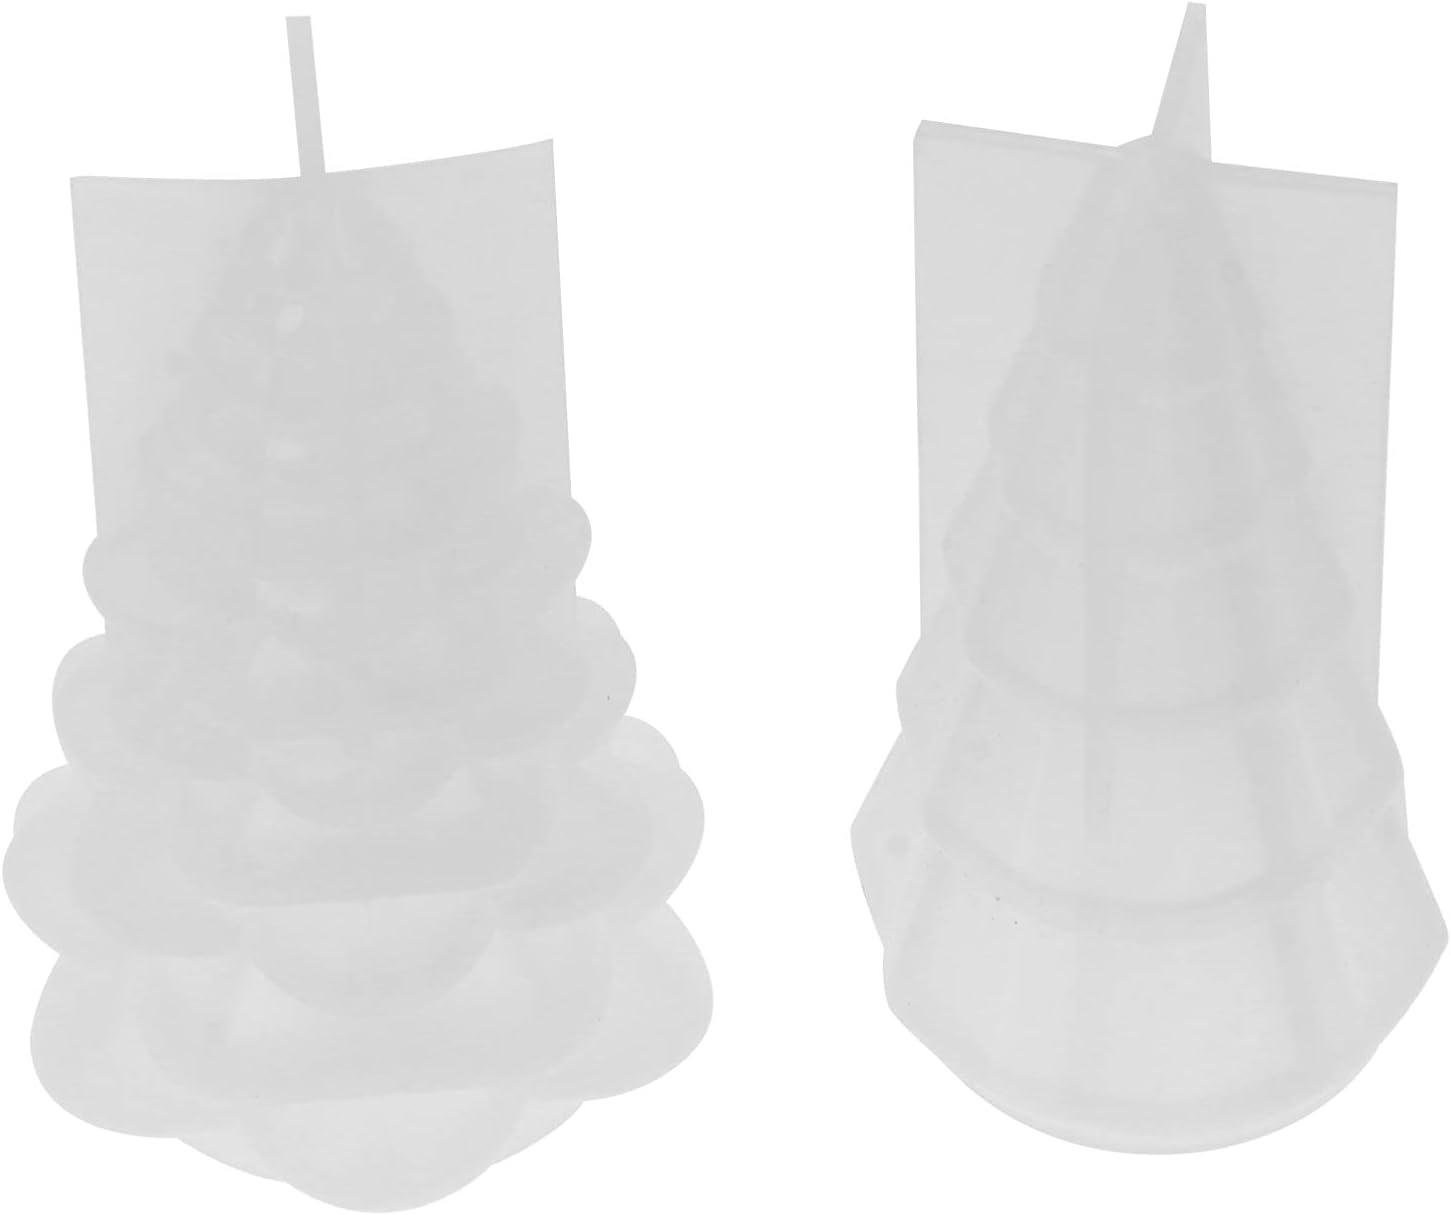 BESPORTBLE 3D Christmas Max Gorgeous 79% OFF Tree Silicone Mold Resi Epoxy Resin 2Pcs